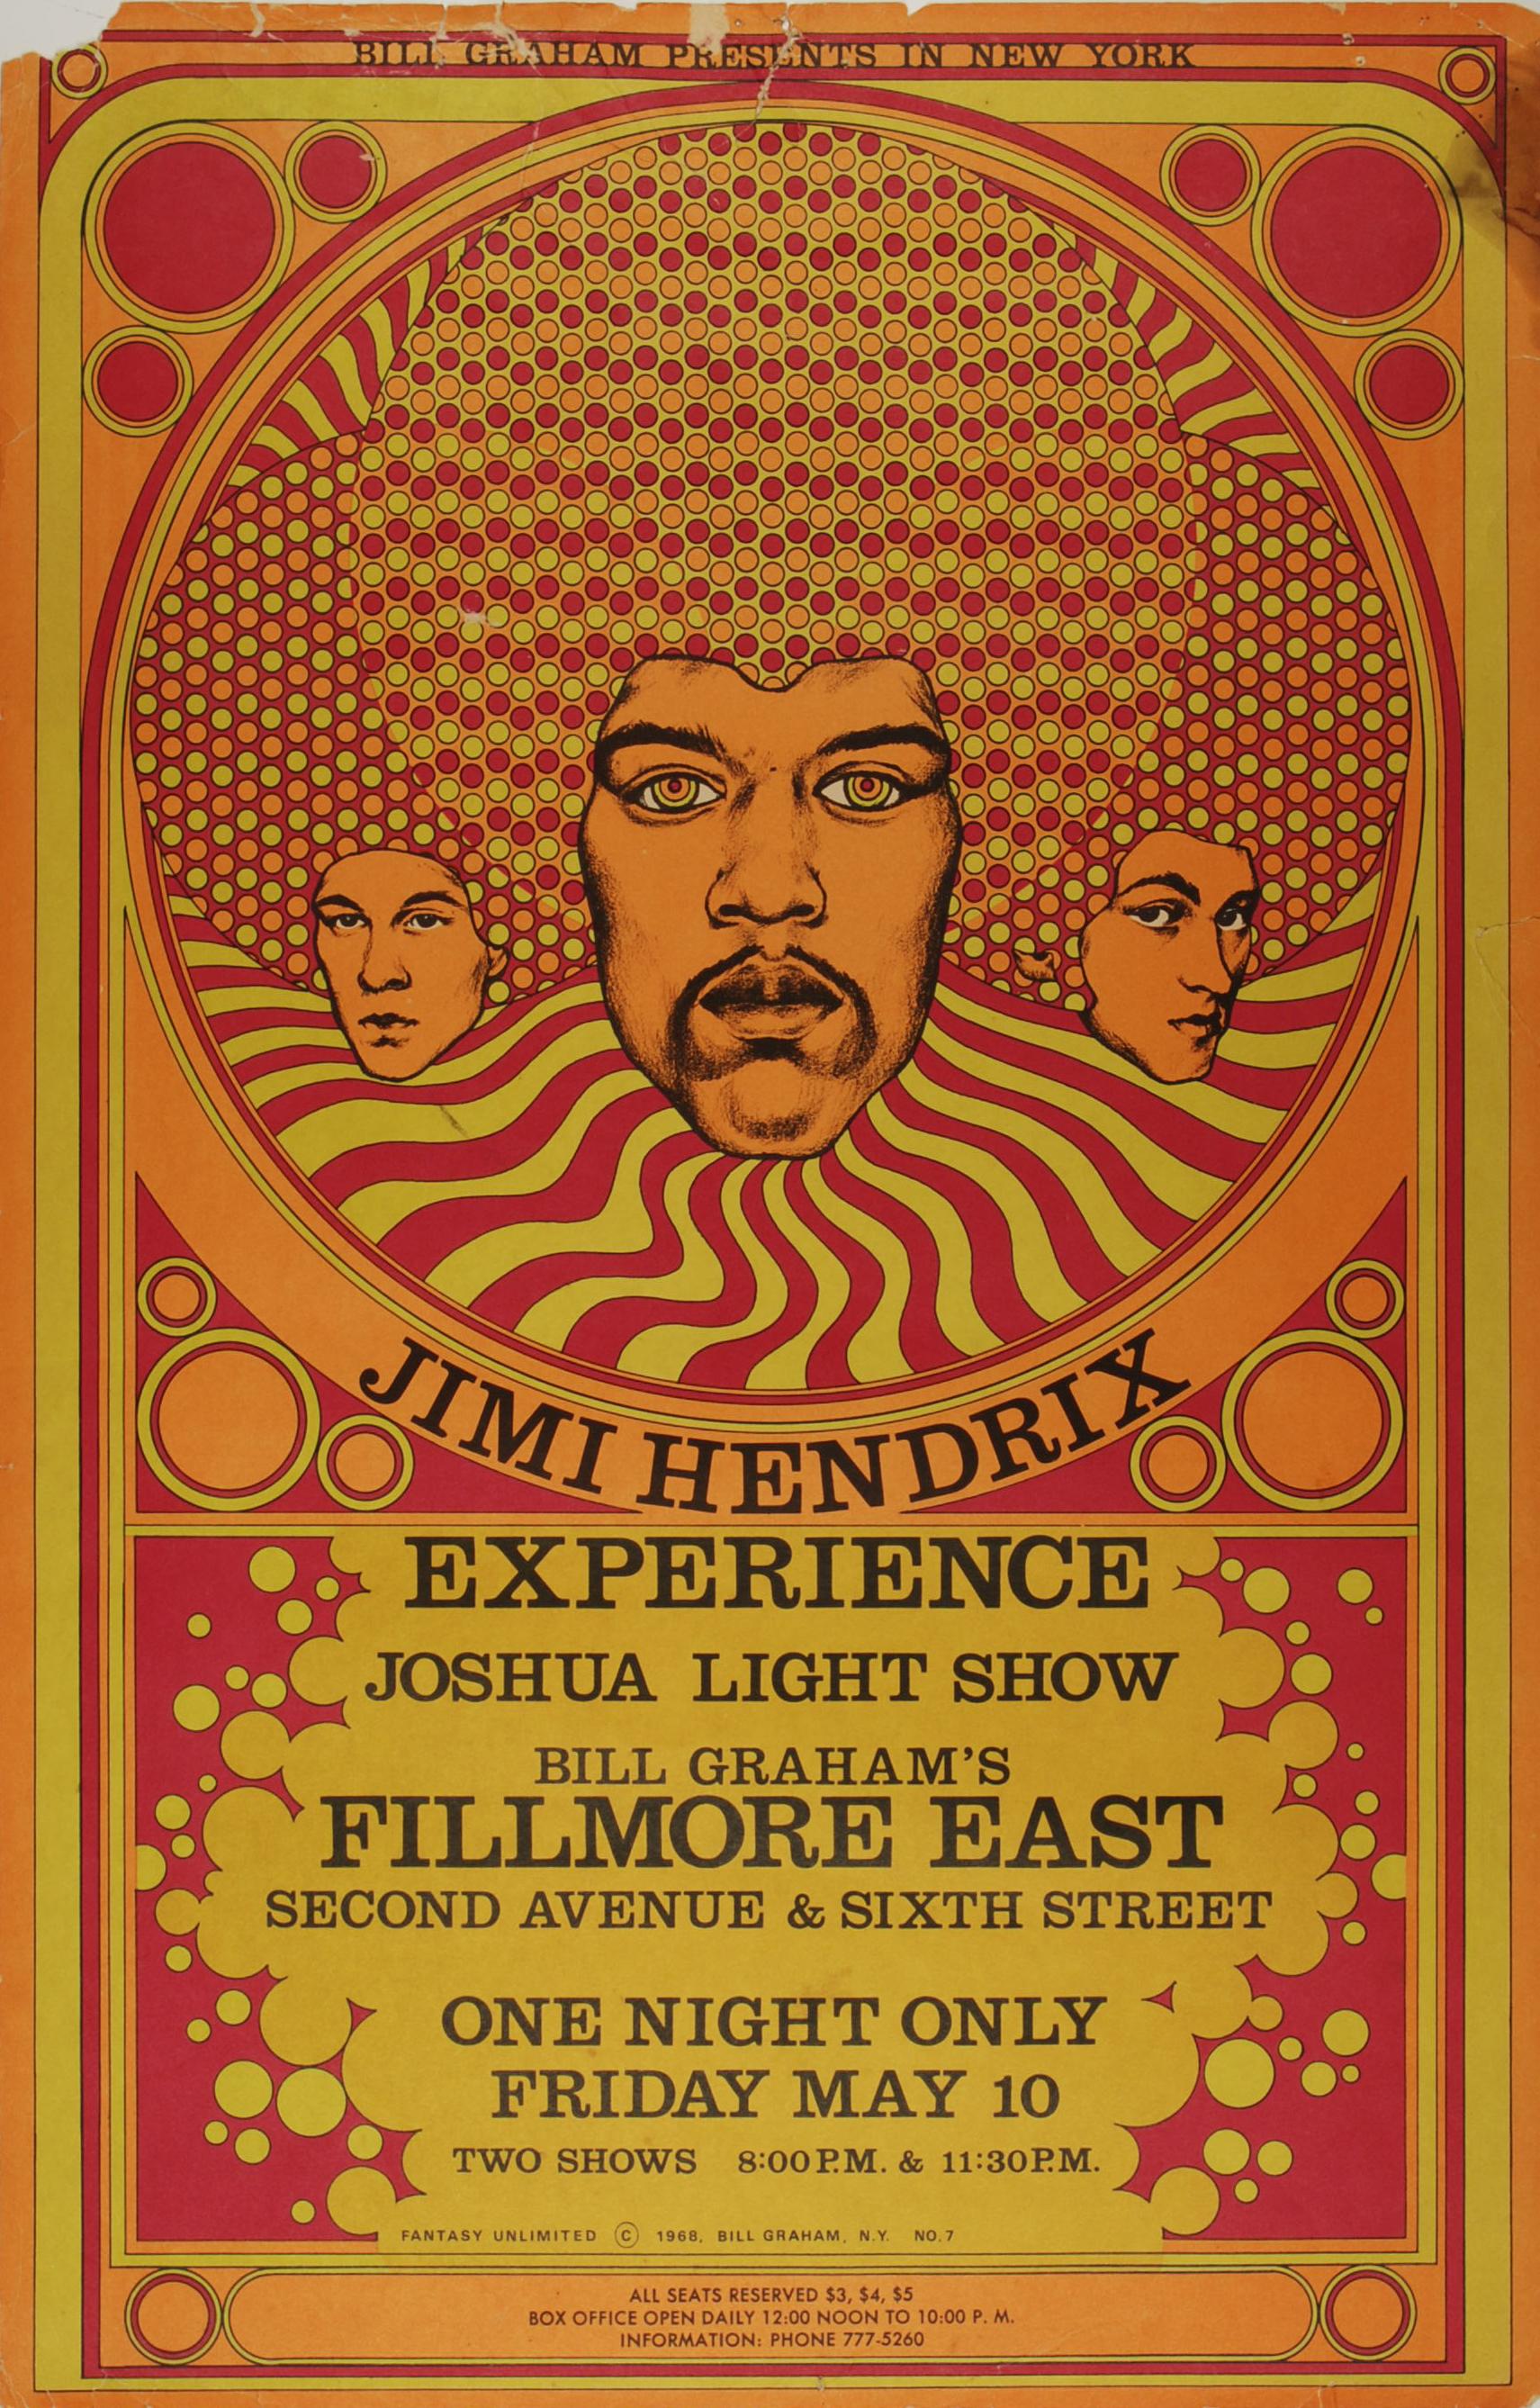 Jimi Hendrix Experience Joshua Light Show